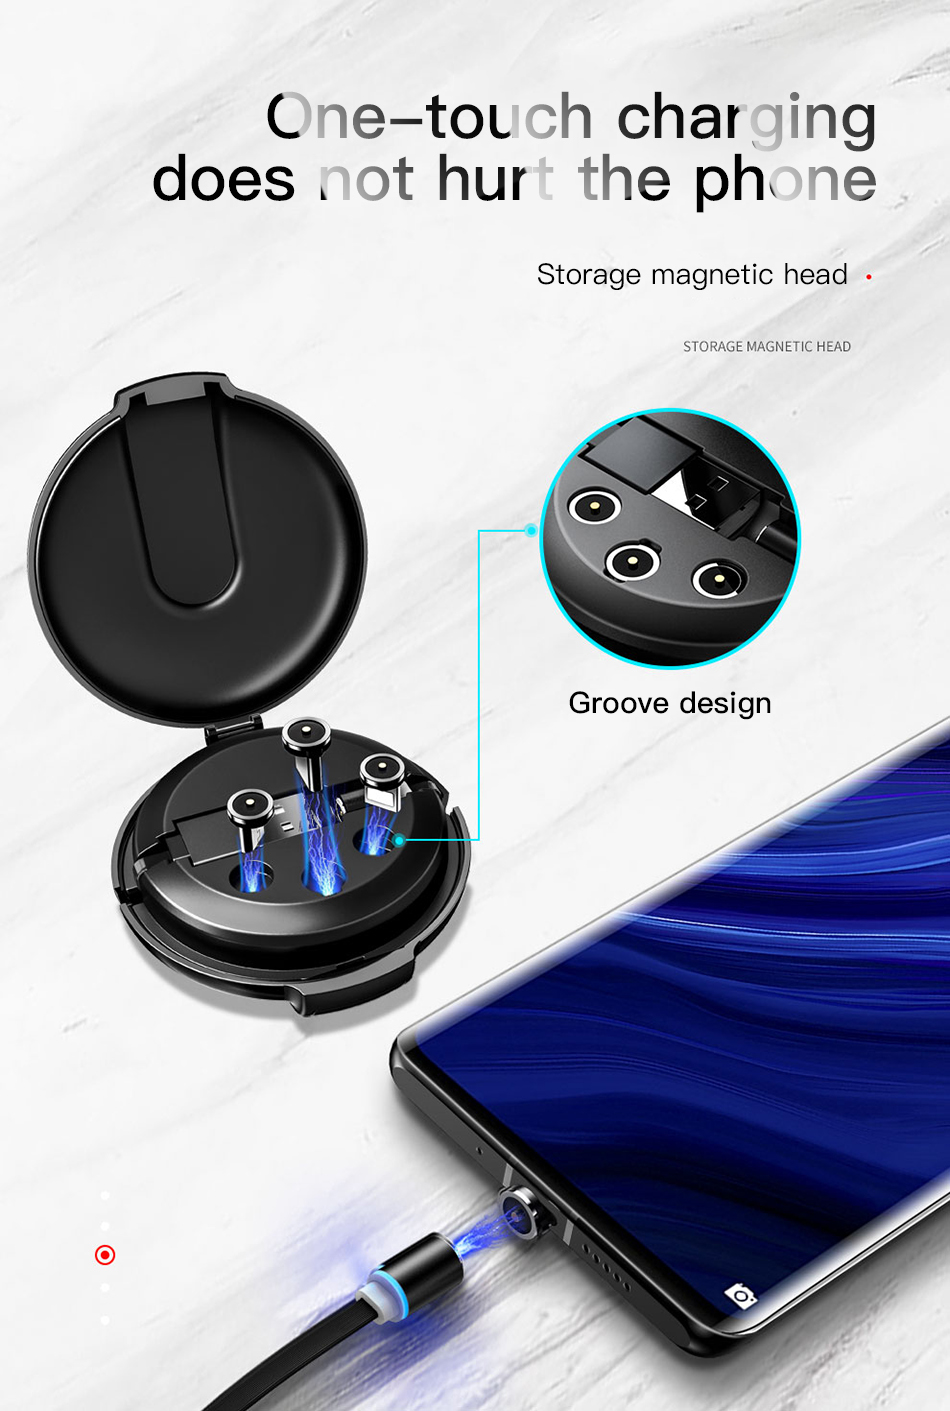 ACCEZZ 3合1磁性电缆,带整理盒,适用于iPhone XS XR 11 Pro Max Micro Micro USB Type C磁铁充电器电缆(4)